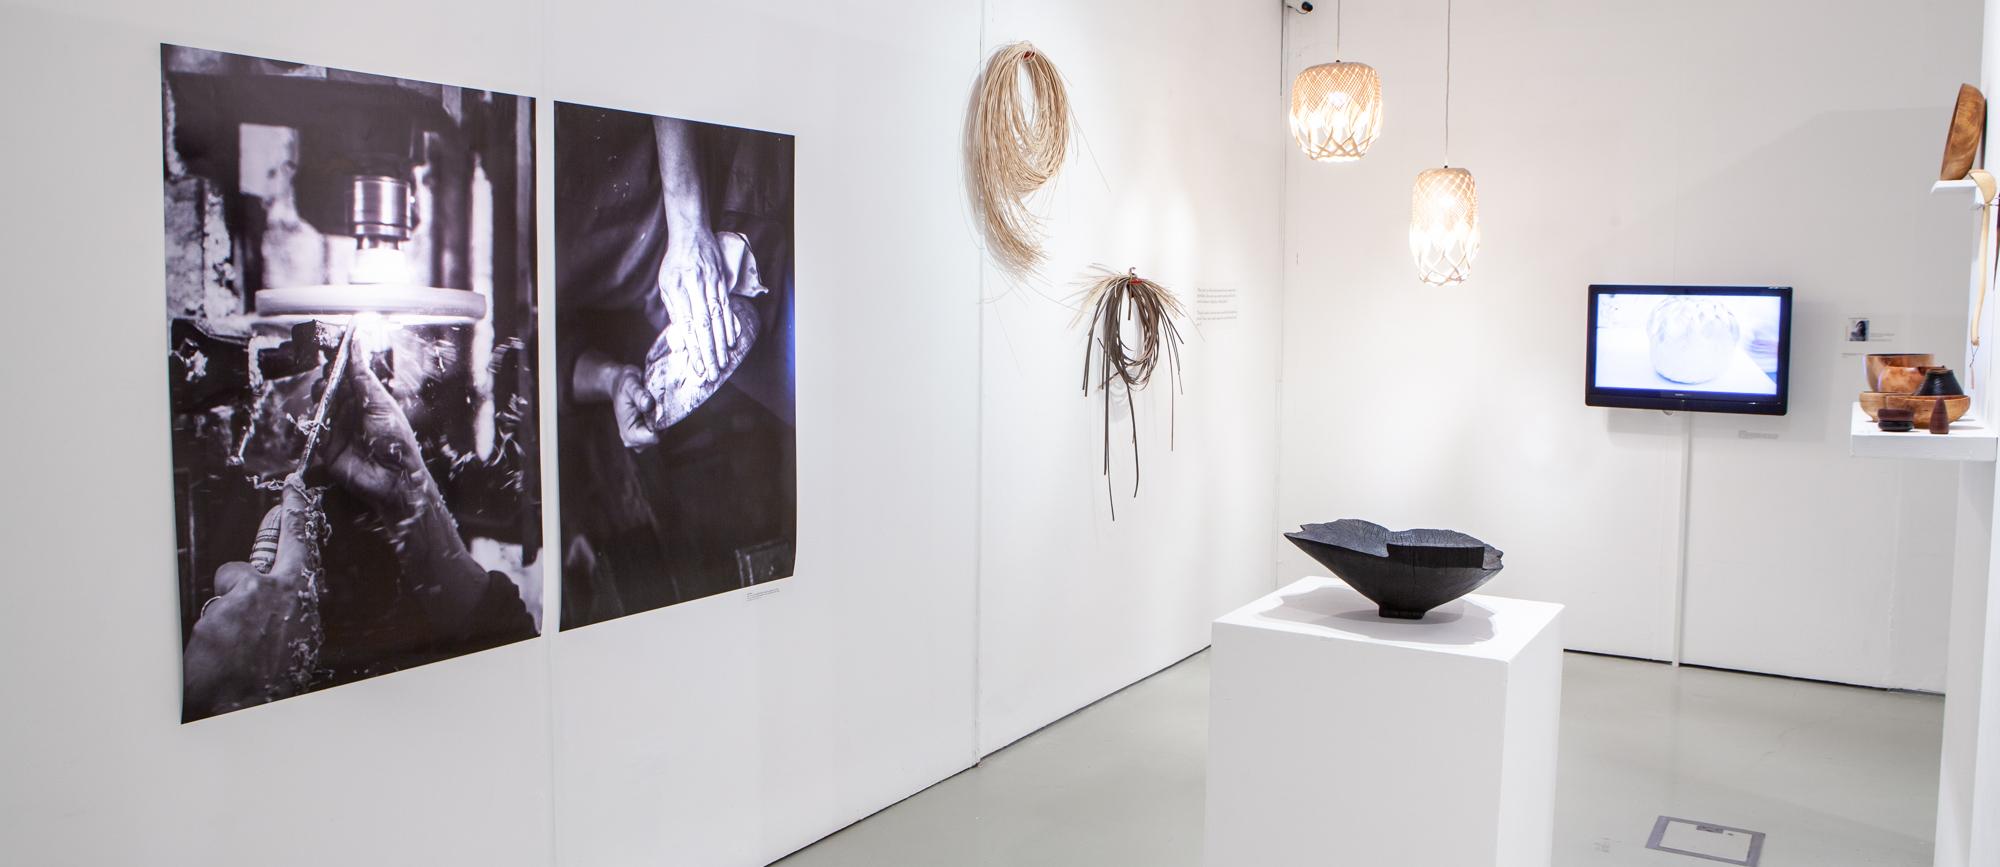 2018.11.18 Creu Make Exhibition-13.jpg